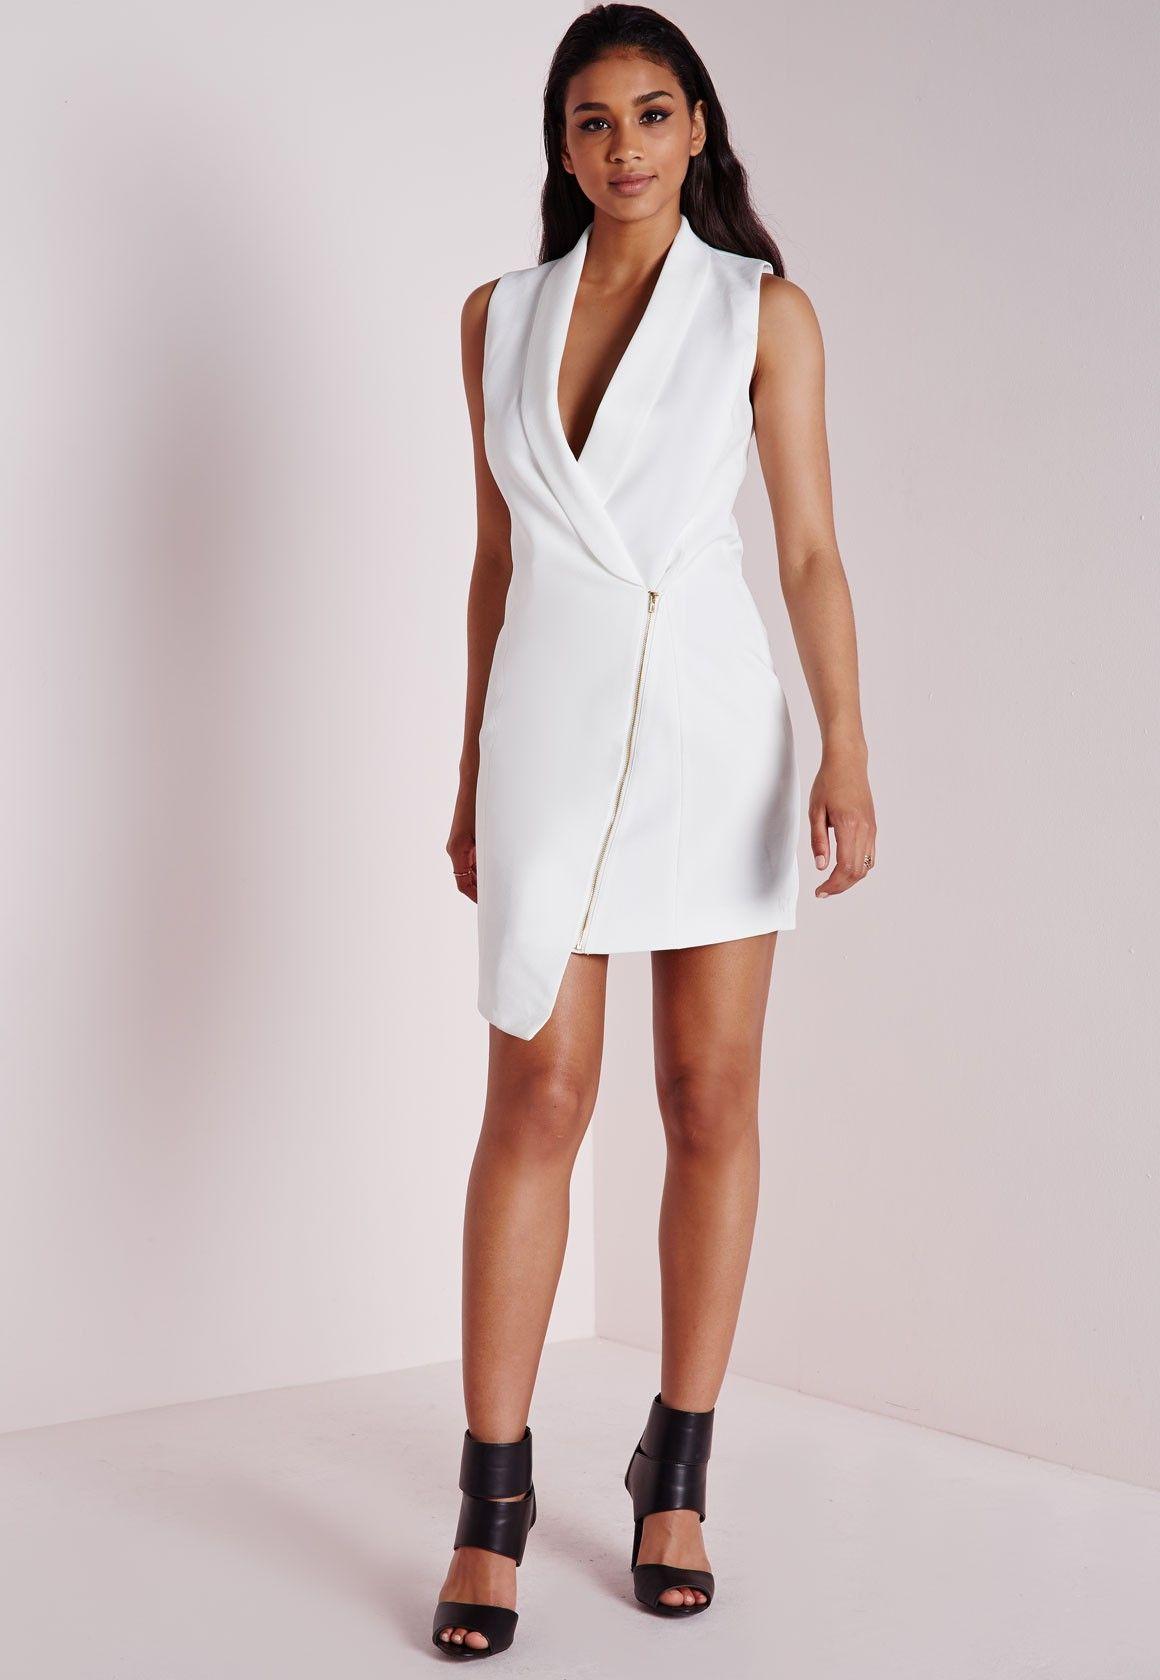 5995813b74461 Crepe Sleeveless Blazer Dress White - Dresses - Missguided